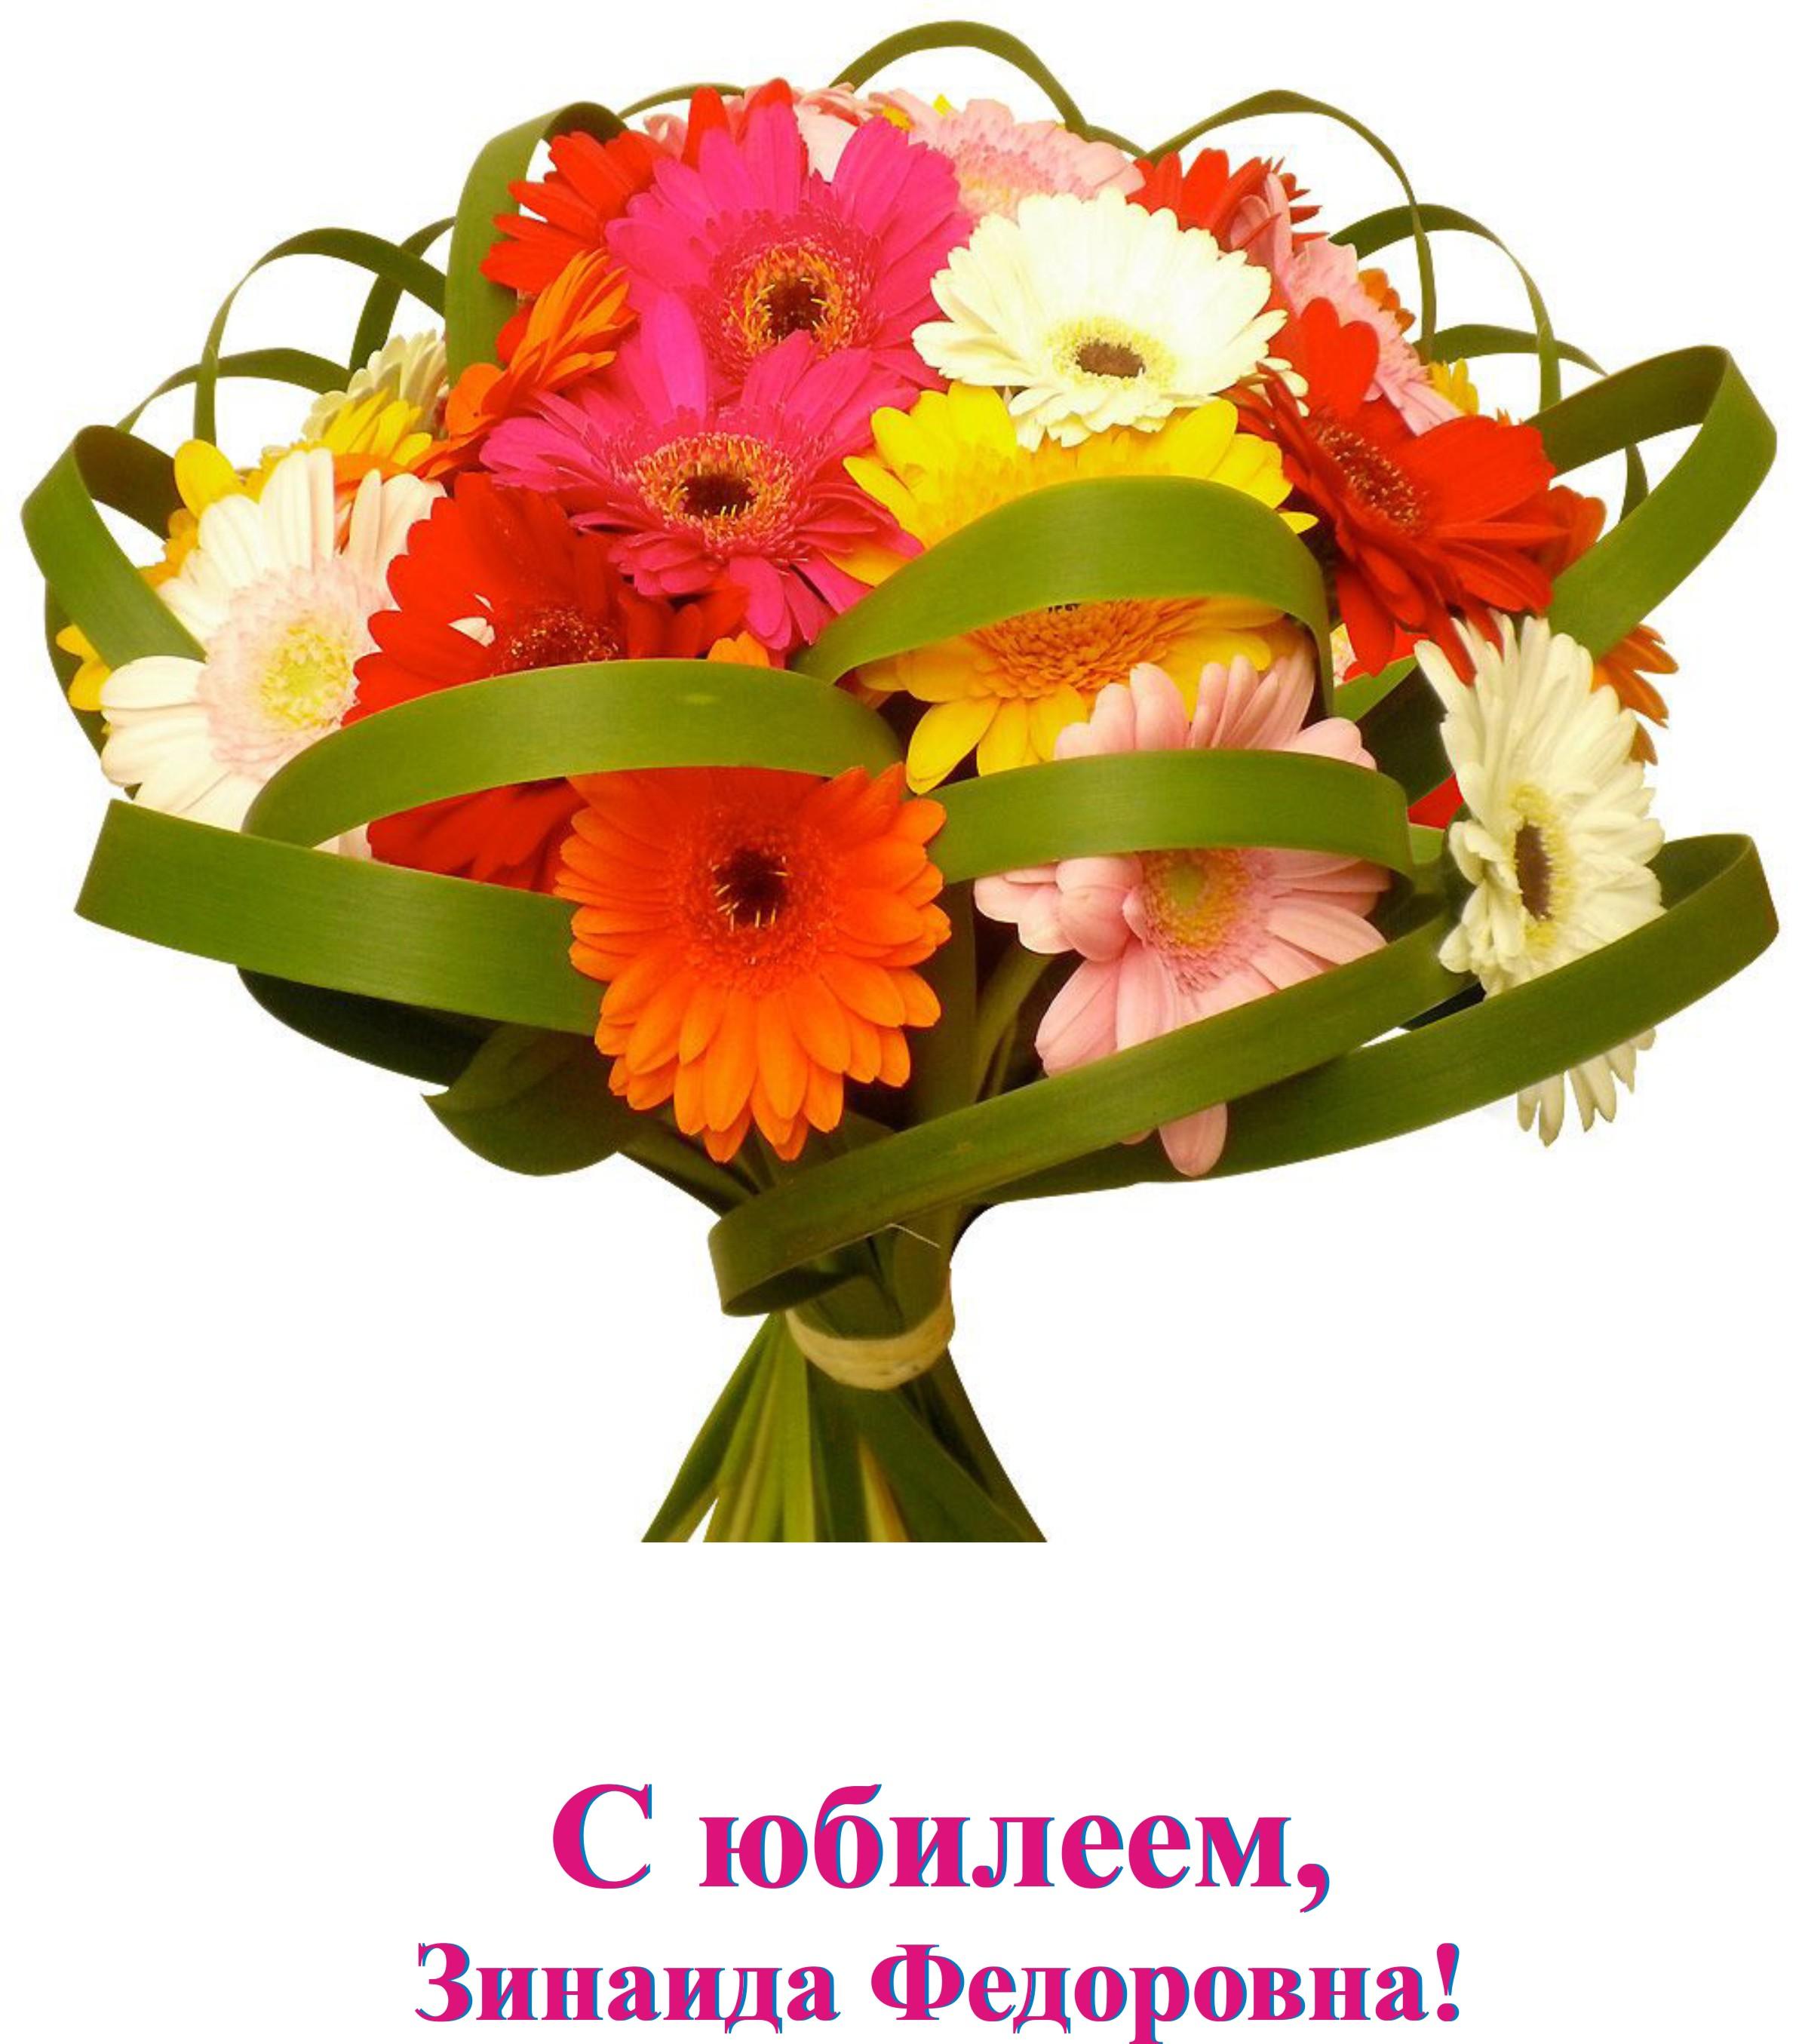 Read more about the article Поздравляем с 80-летним юбилеем Кочергину (Карпееву) Зинаиду Федоровну!